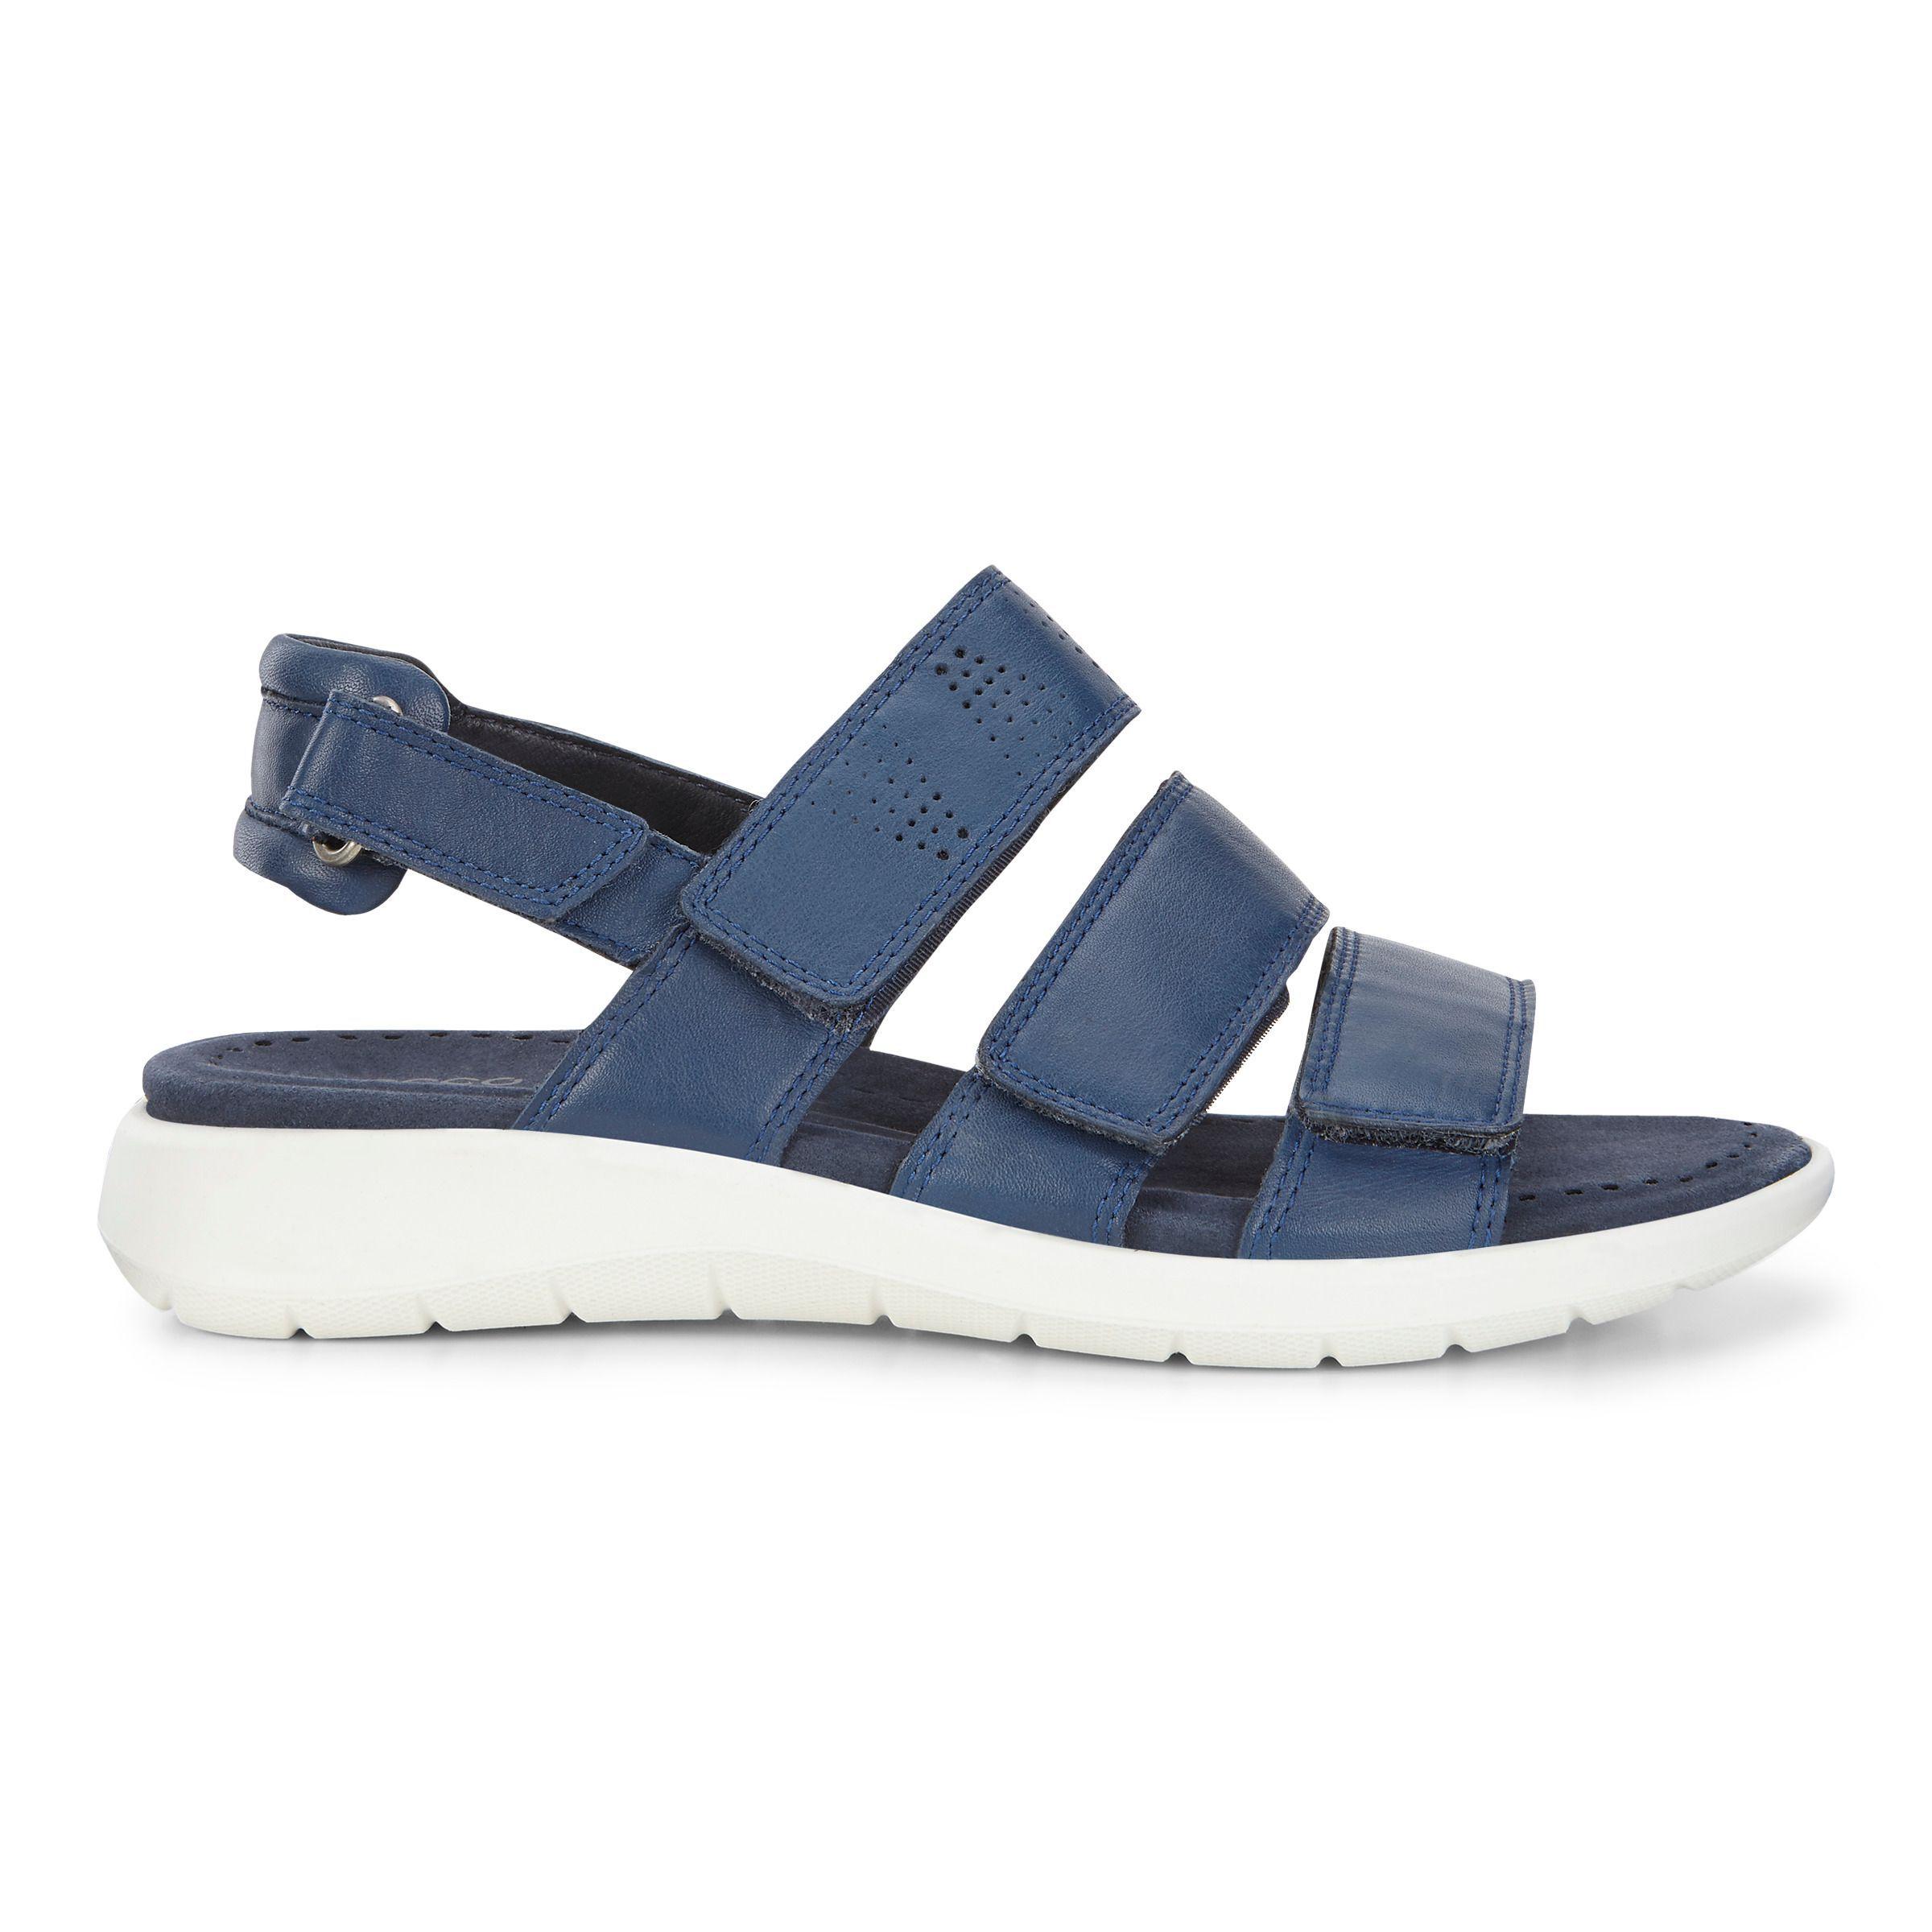 Ecco Store Ecco Womens Babett Sandal 3 Strap Brand New White Leather Multi Sizes